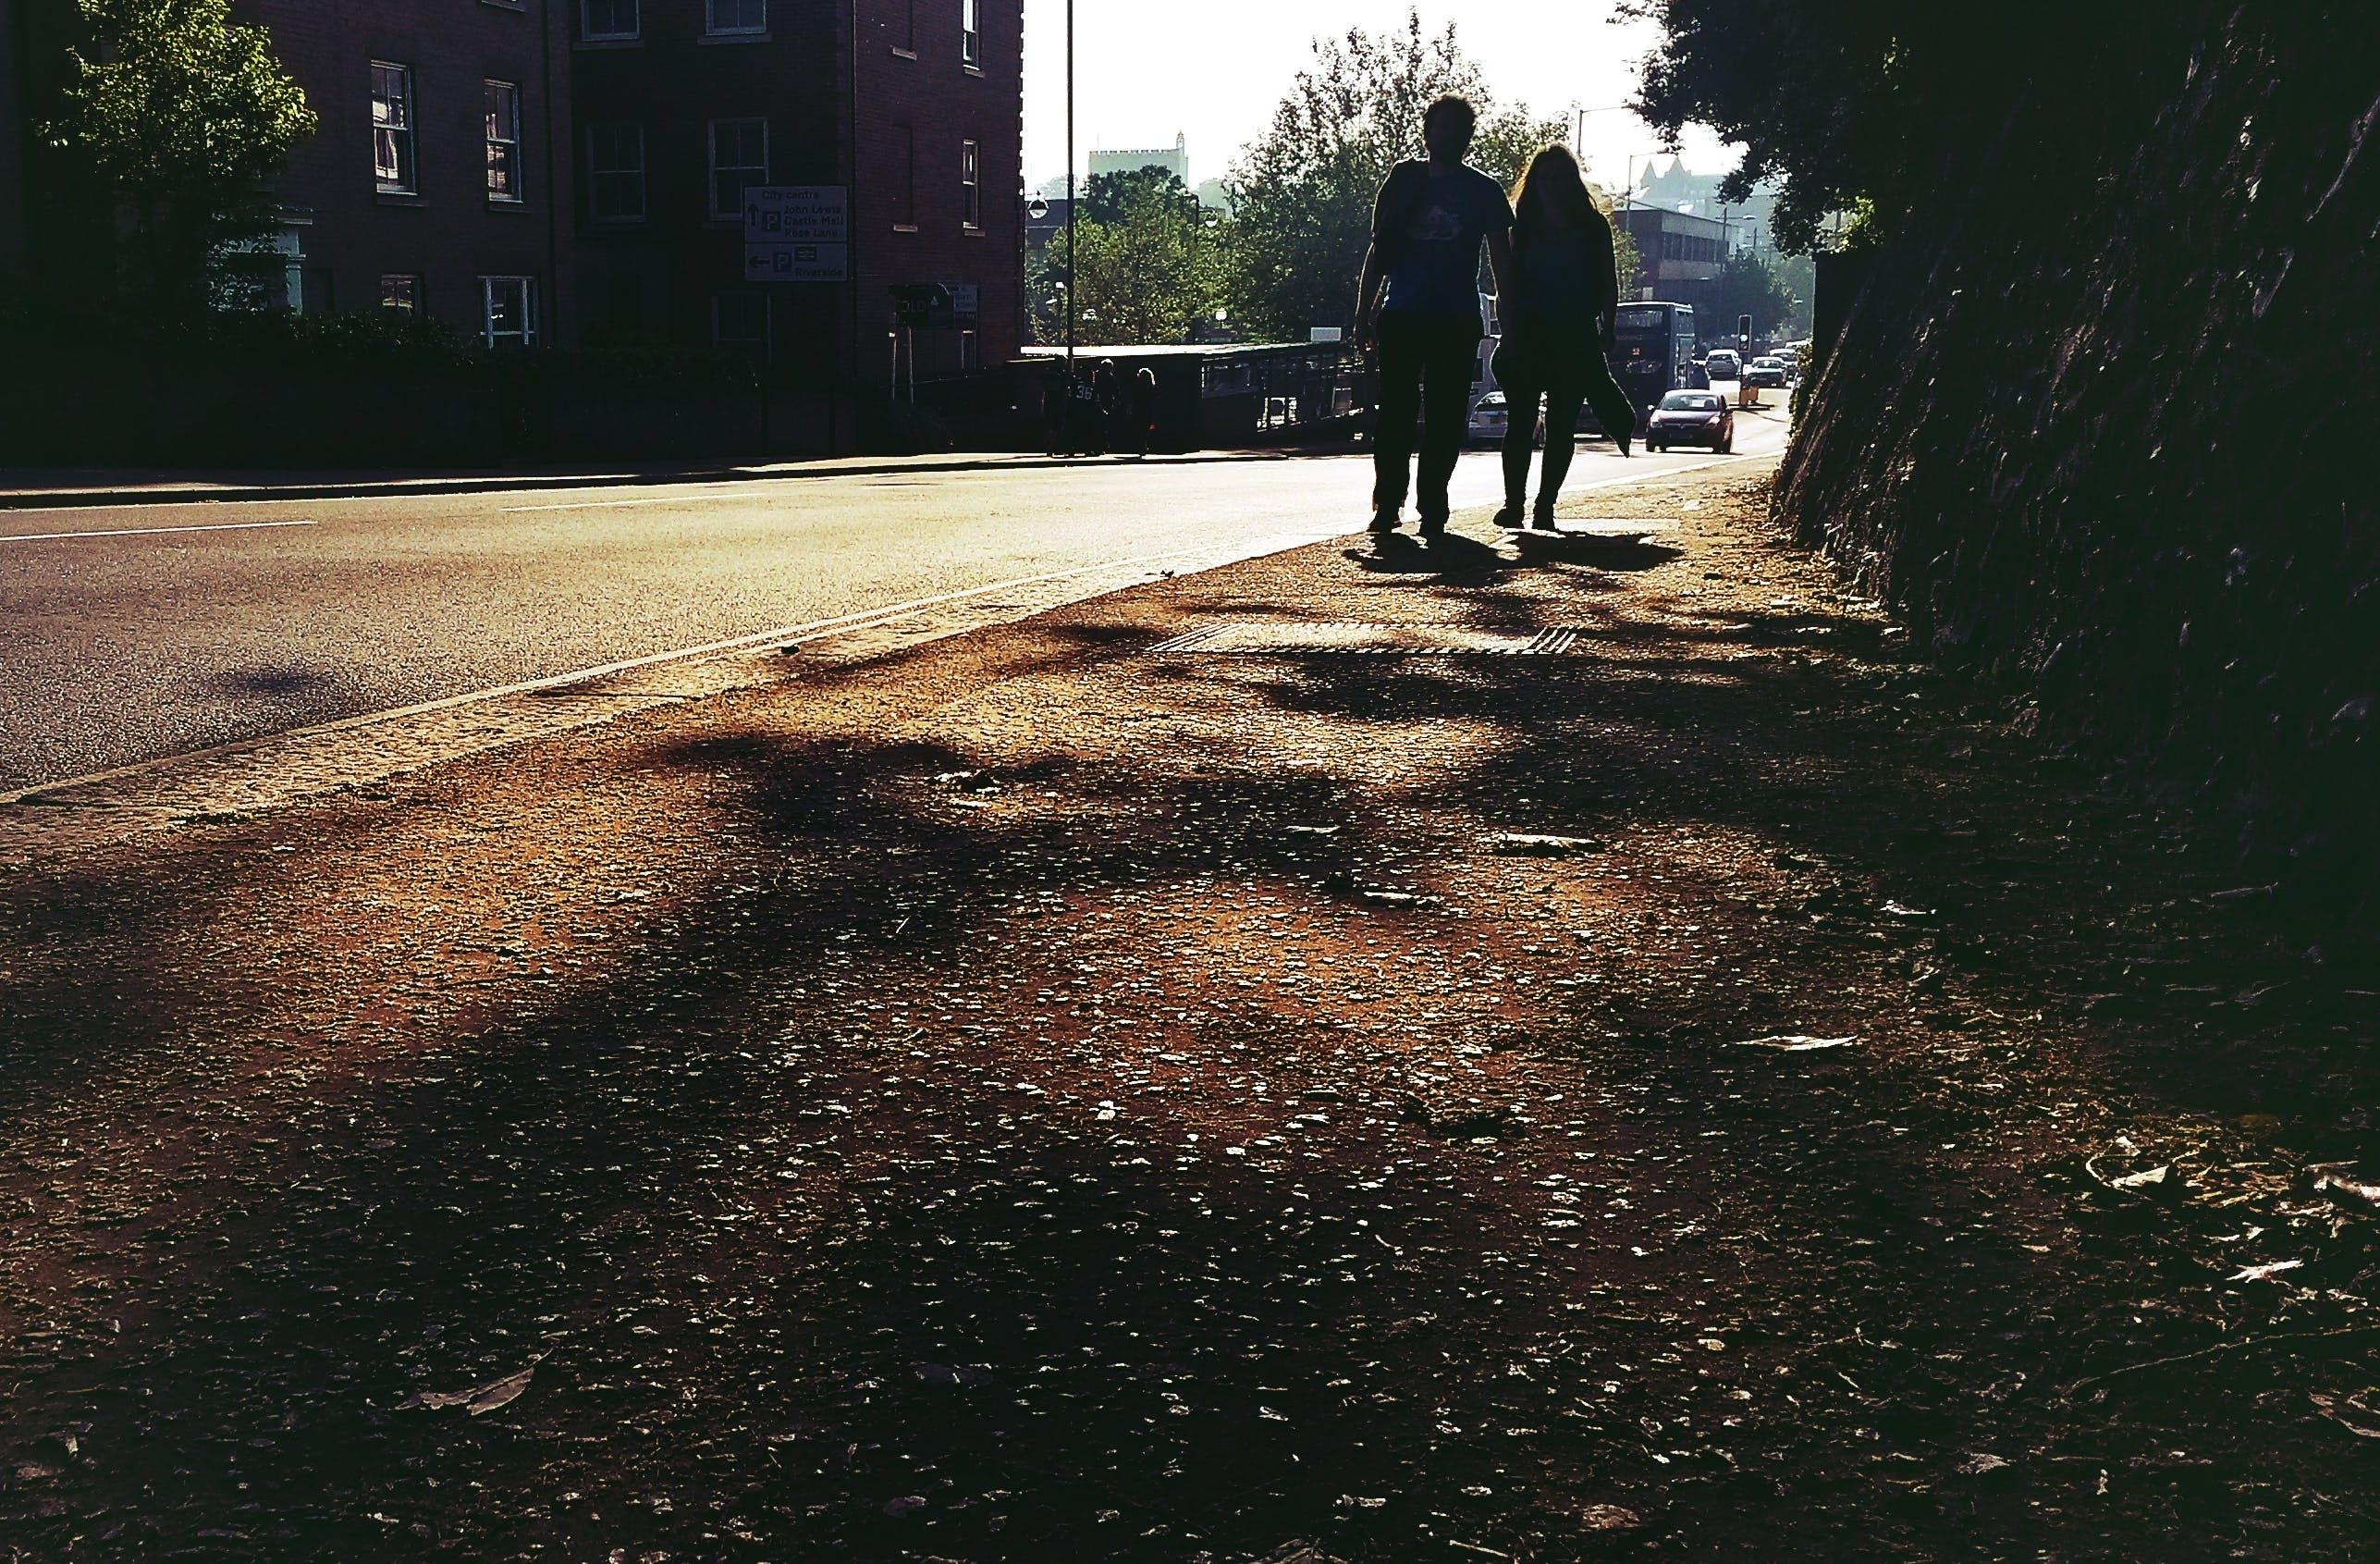 Free stock photo of road, couple, street, walking